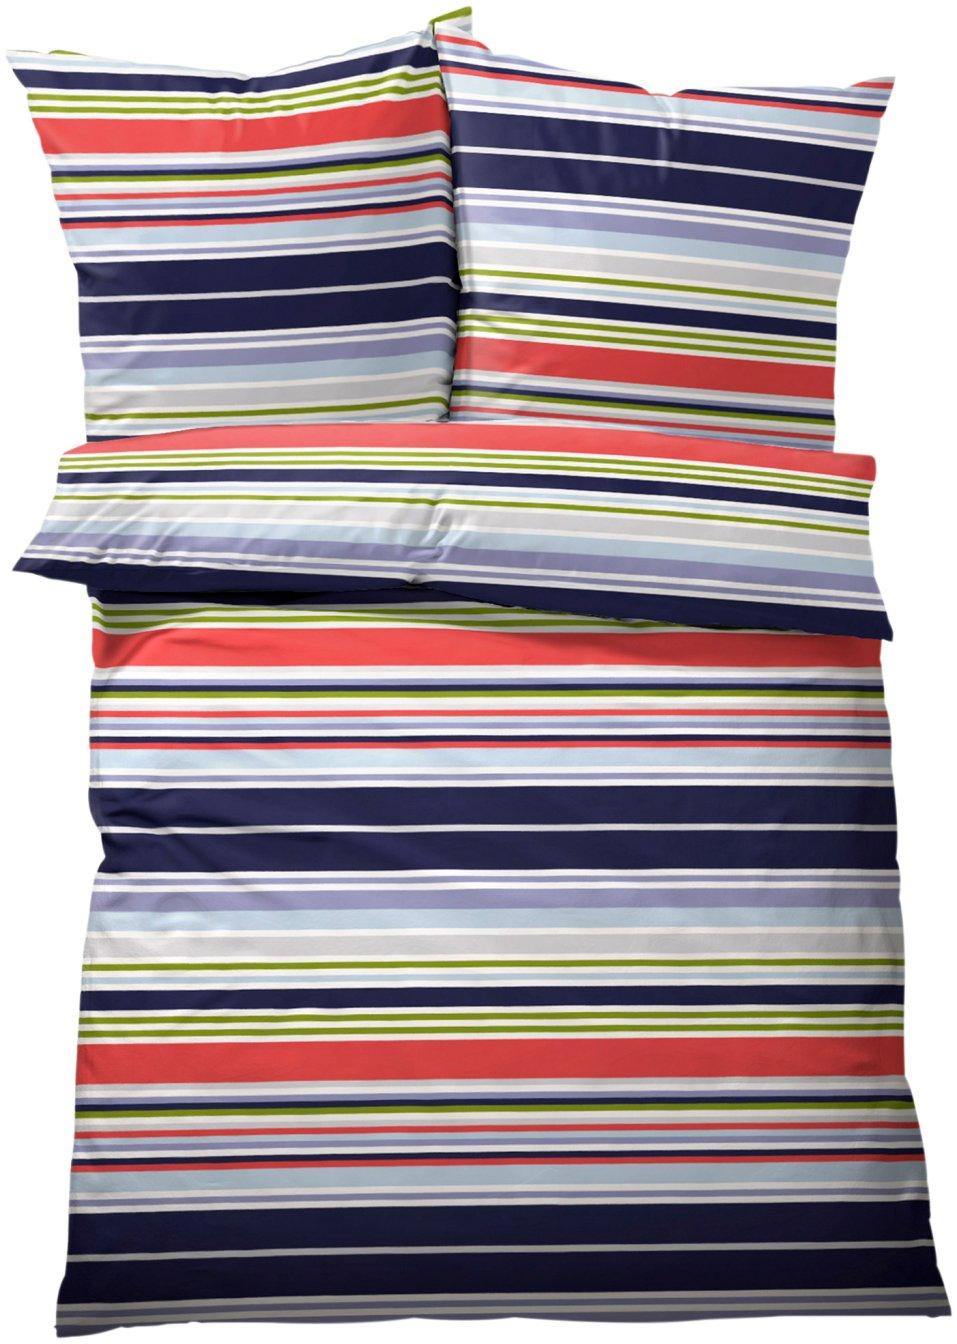 farbenfrohes wohnaccessoire die bettw sche filip blau rot linon. Black Bedroom Furniture Sets. Home Design Ideas